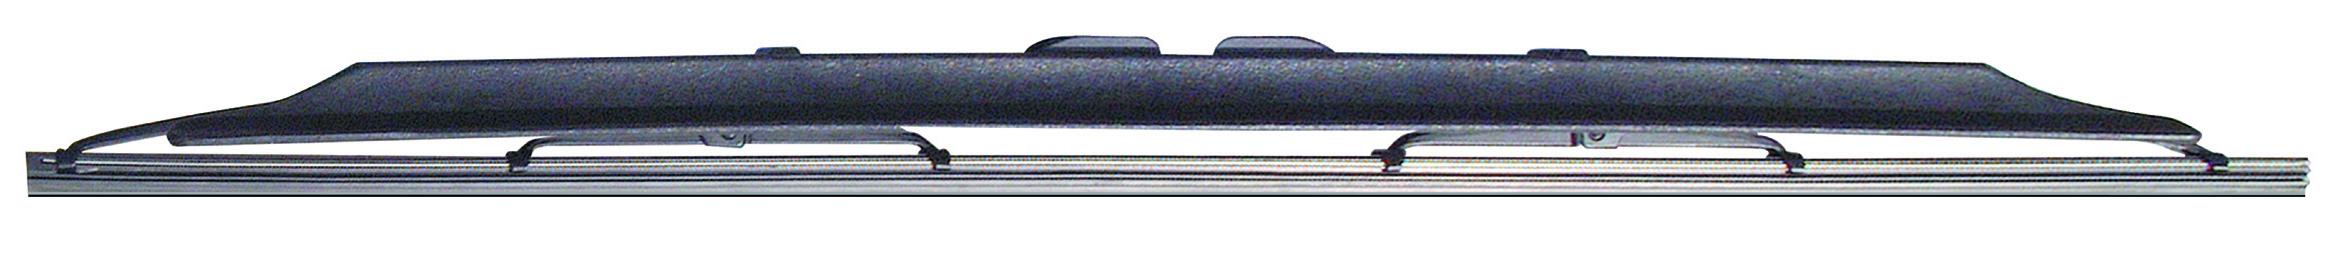 SB-22